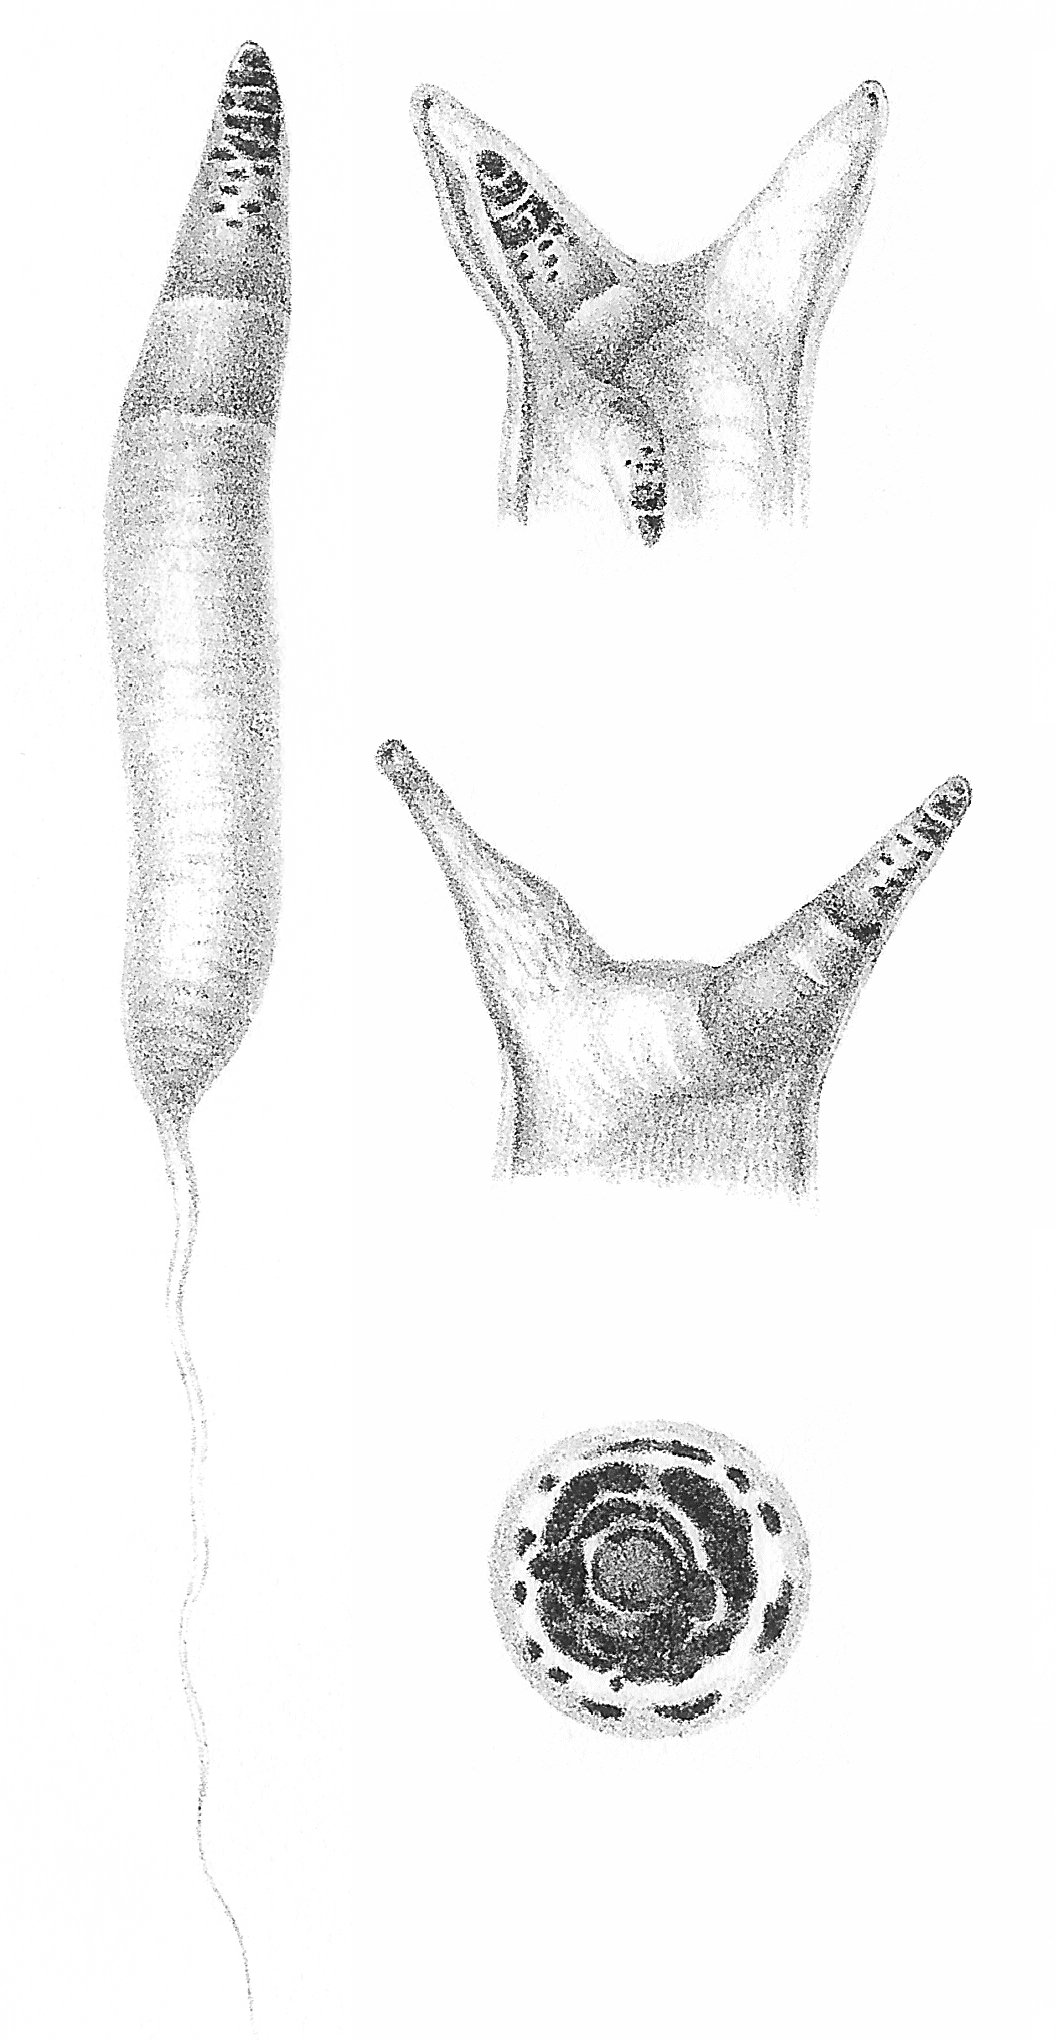 Leucochloridium paradoxum - Wikipedia